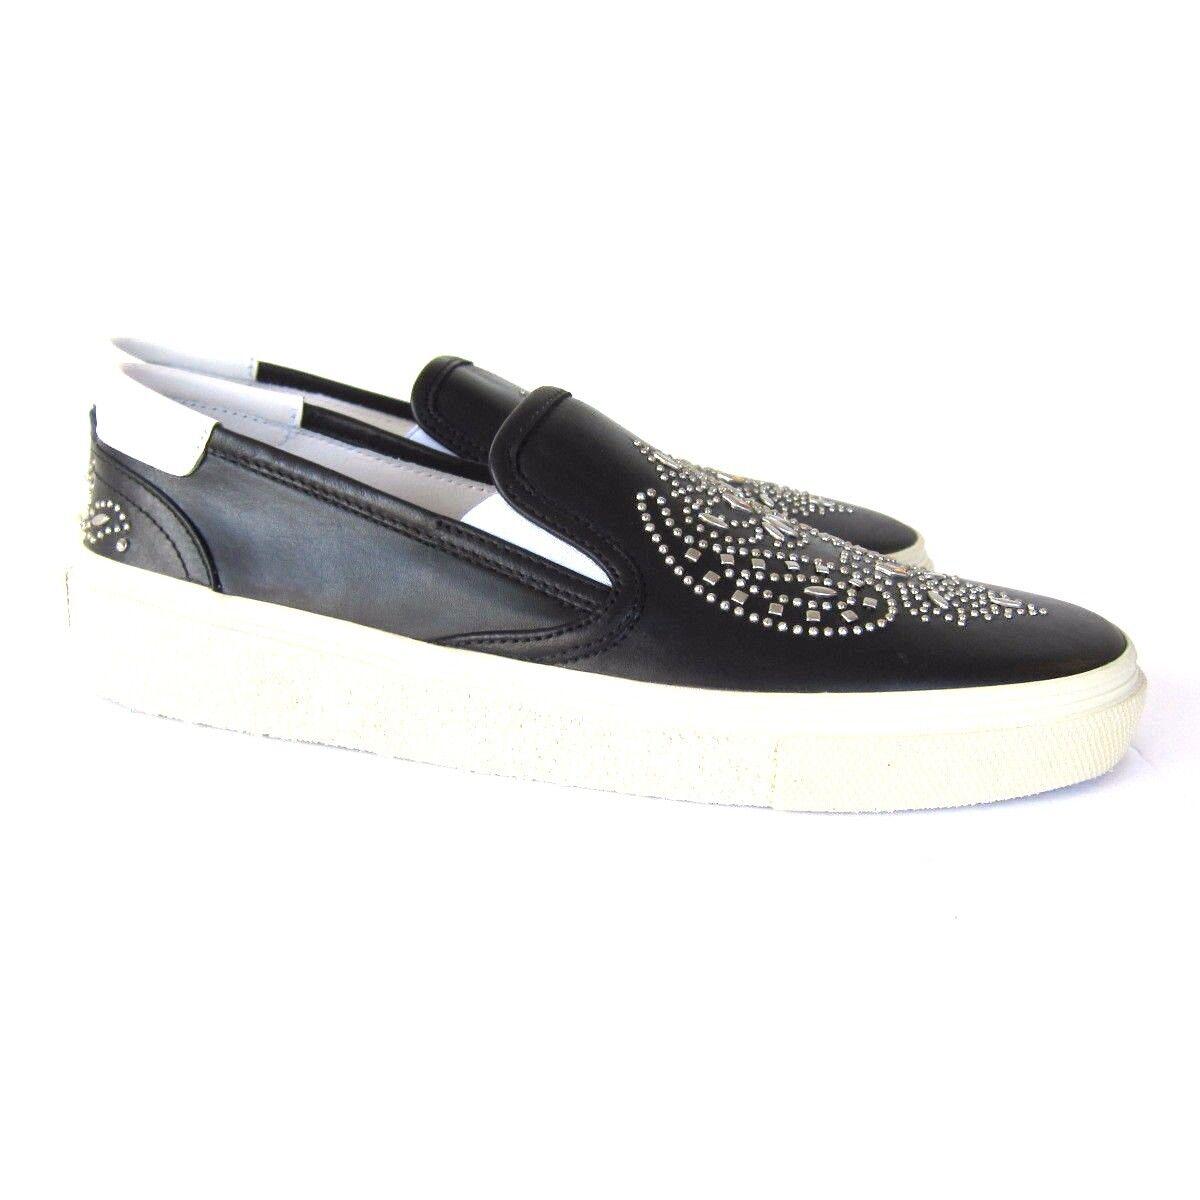 J-2667129 Nuevo Saint Laurent Negro Bandana Skate Plano Zapatillas Zapatos Talla